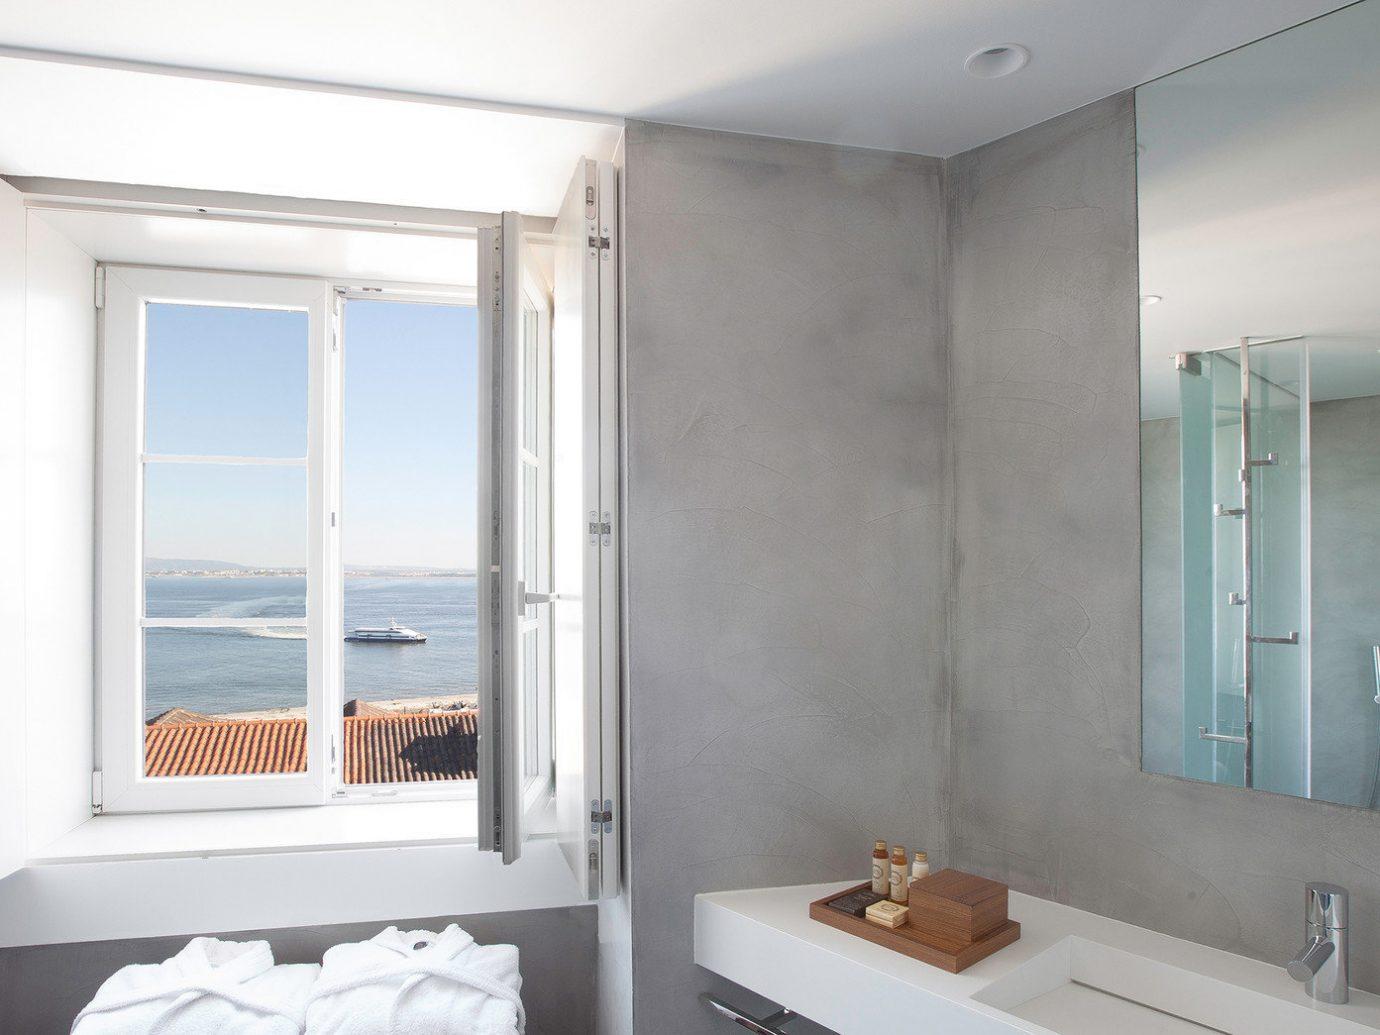 Hotels wall indoor bathroom room mirror property window white sink home interior design real estate apartment estate plumbing fixture